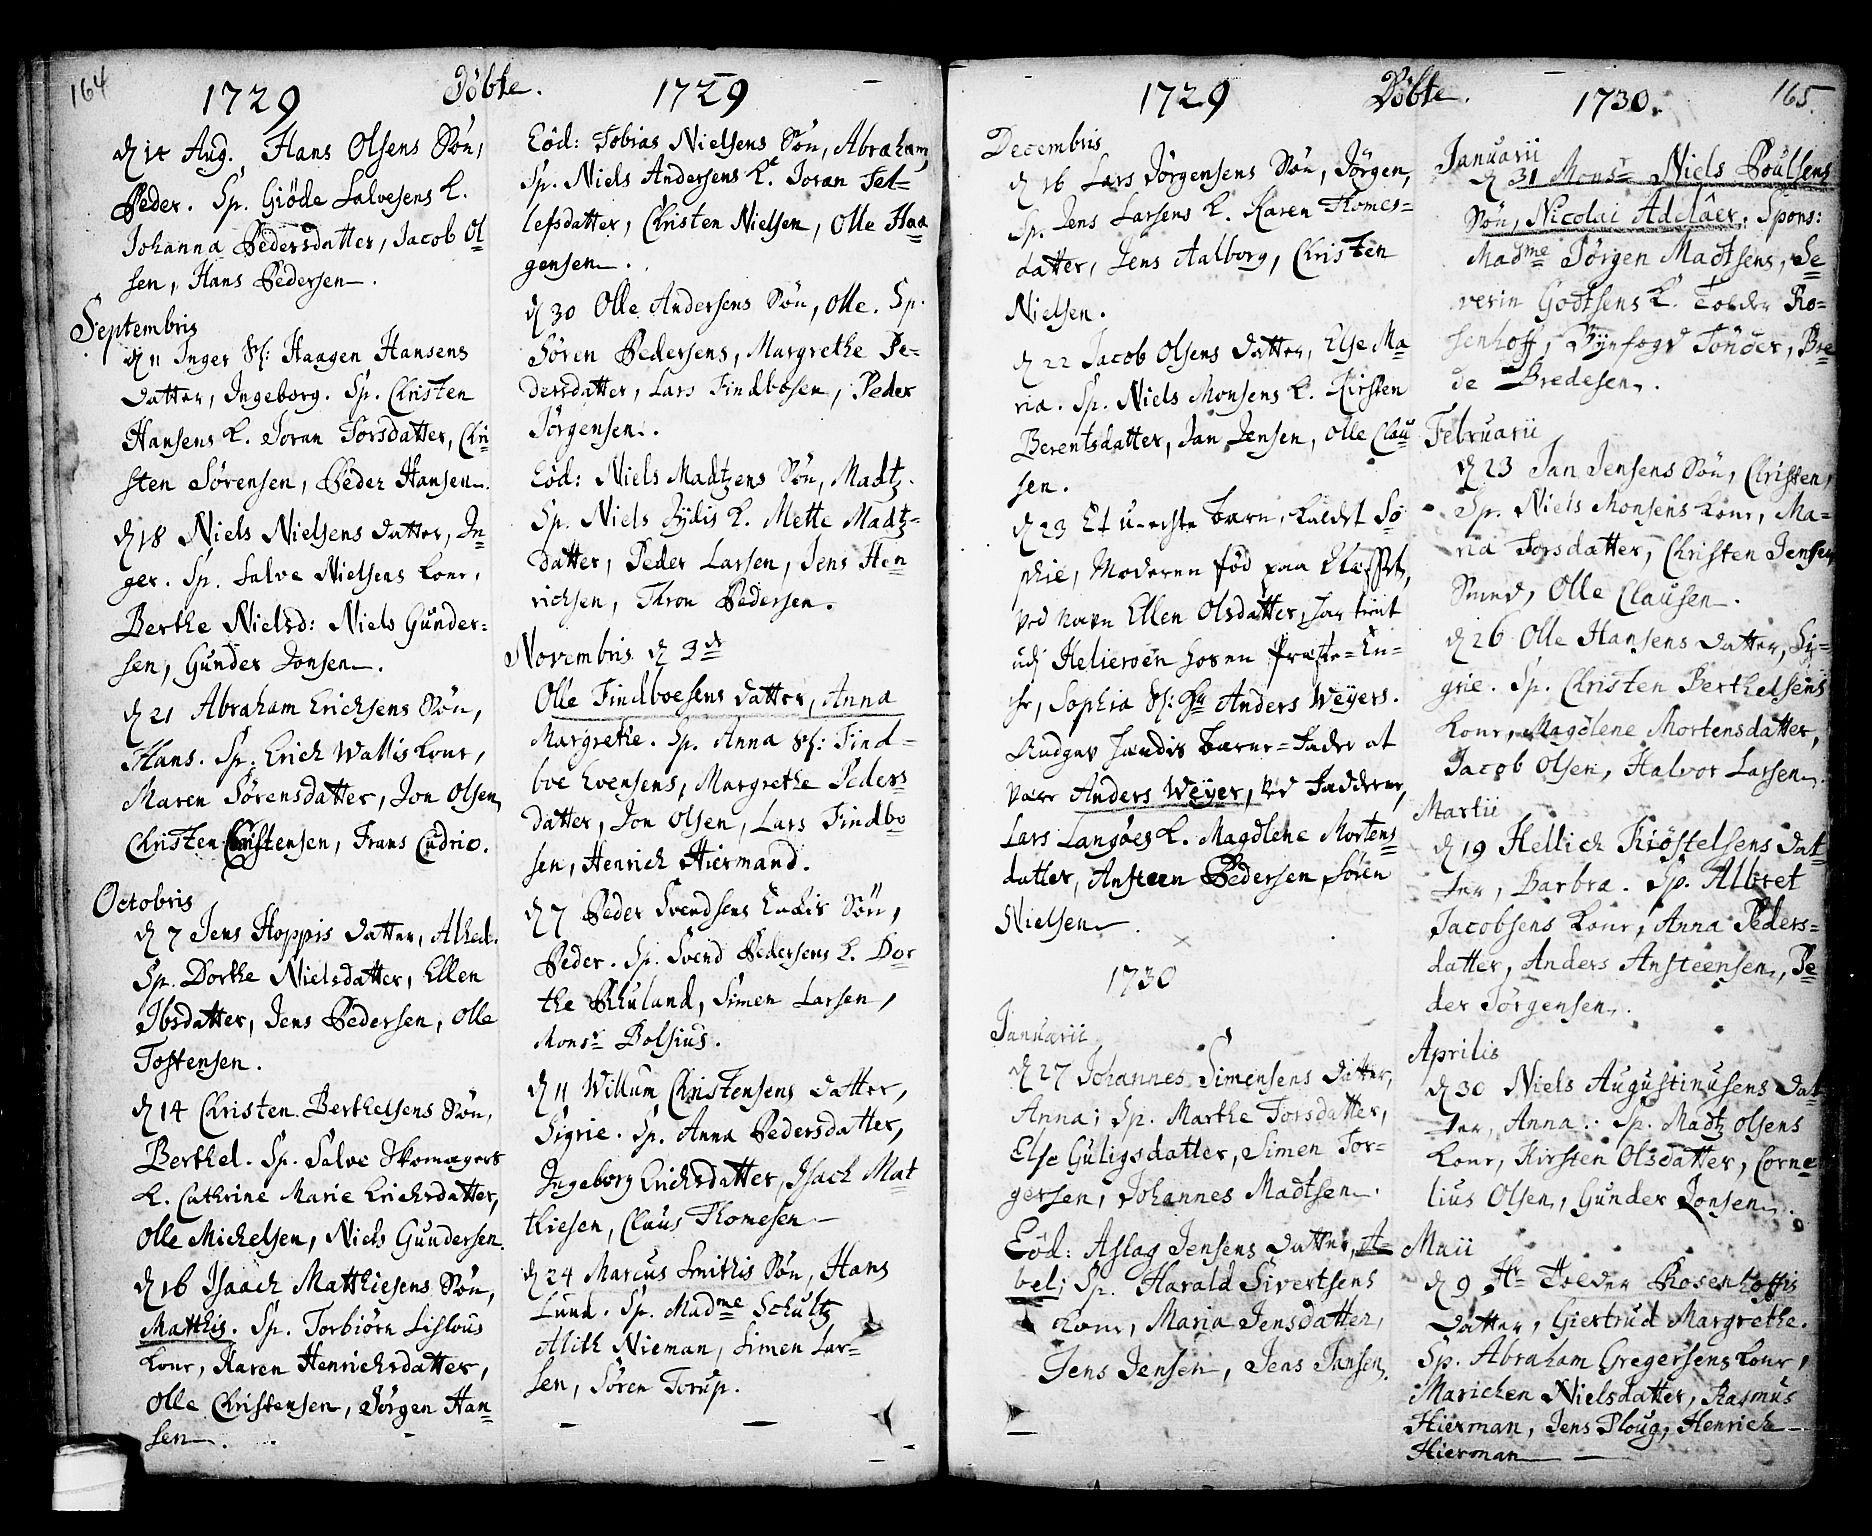 SAKO, Kragerø kirkebøker, F/Fa/L0001: Ministerialbok nr. 1, 1702-1766, s. 164-165